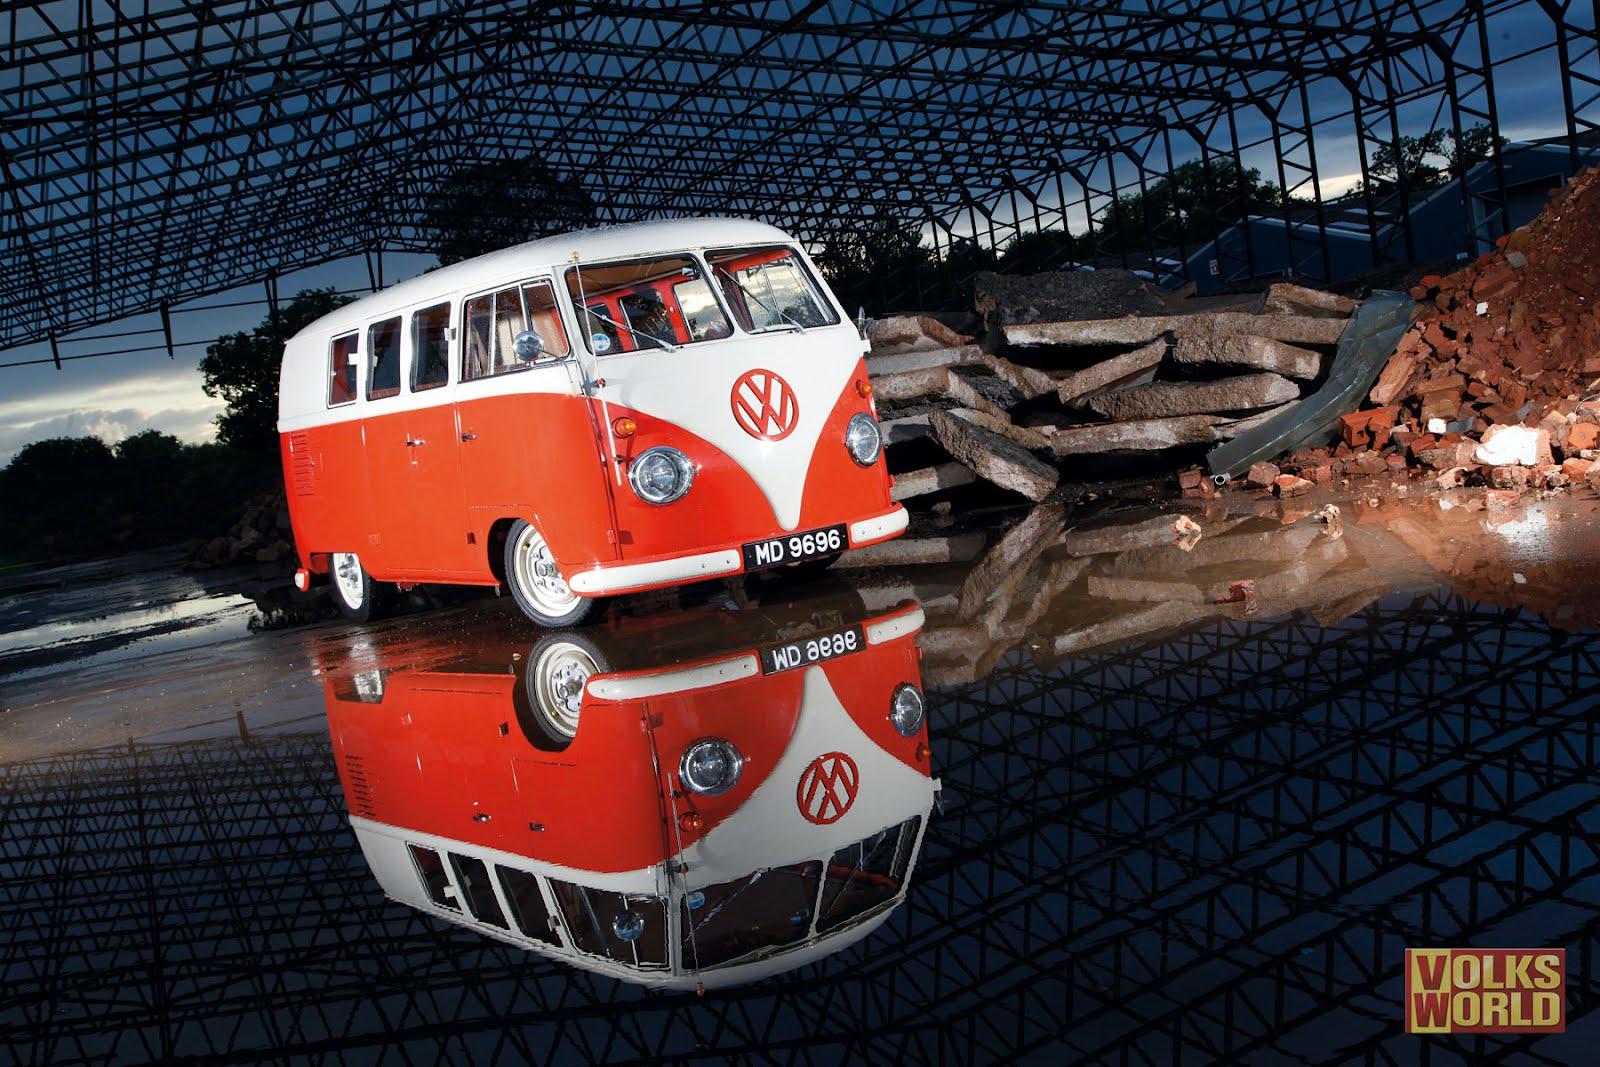 Wallpaper Volkswagen Samba Bus For 1920 X 1080 Hdtv 1080p Hd Wide 1600x1067